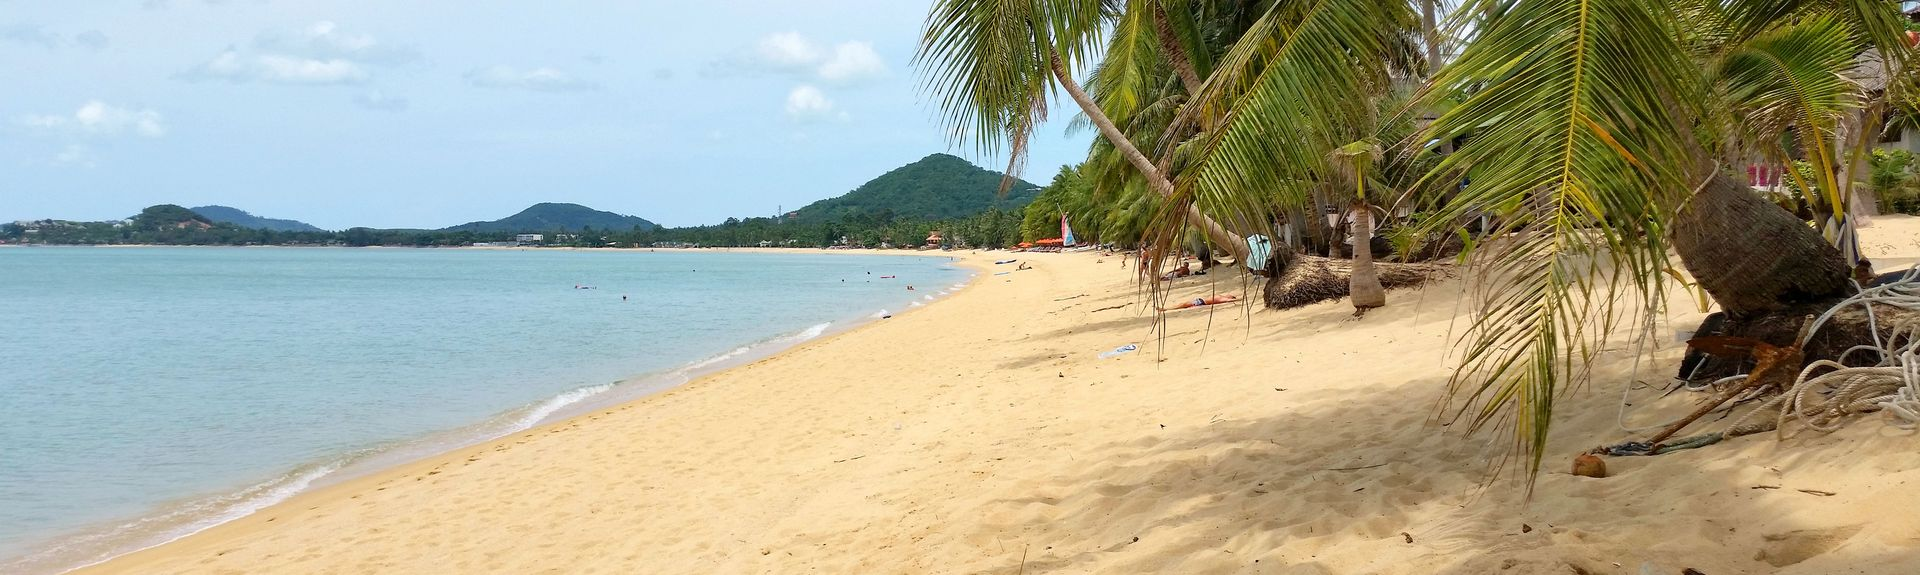 Mae Nam Beach, Provincia de Surat Thani, Tailandia